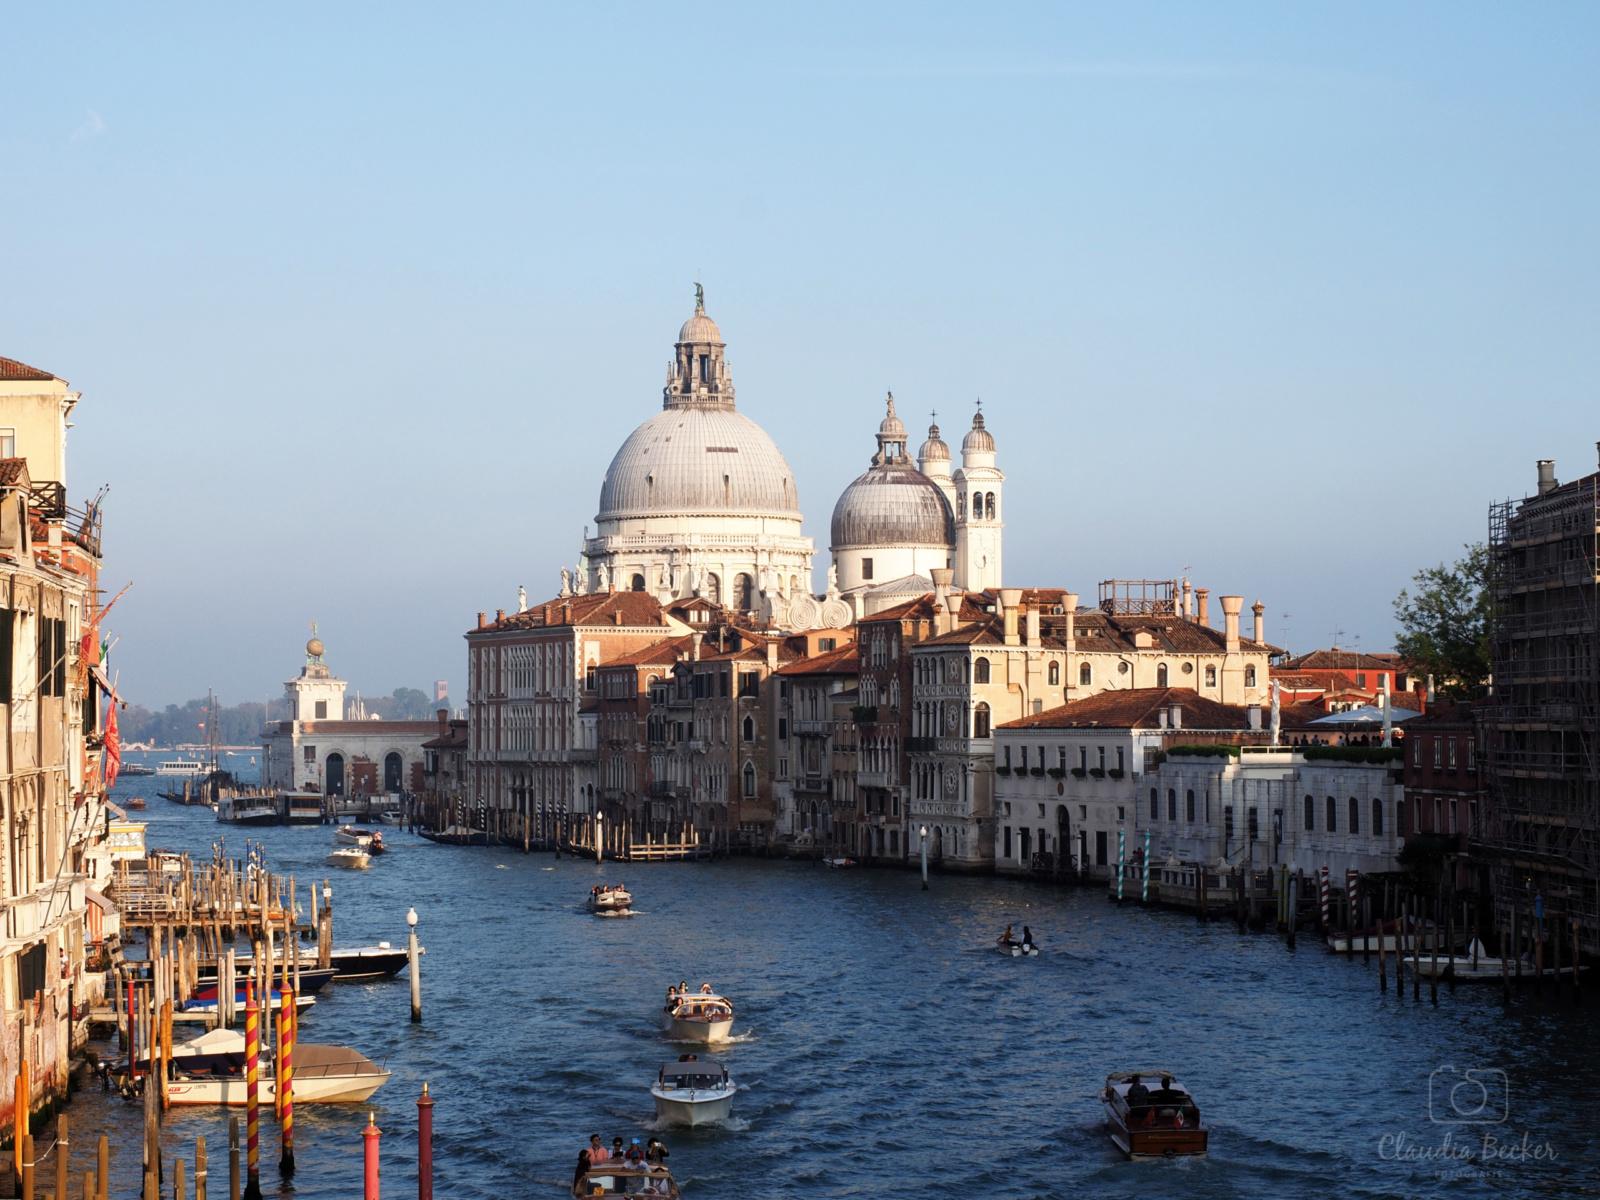 Venedig-2-Blick-auf-die-Santa-Maria-della-Salute